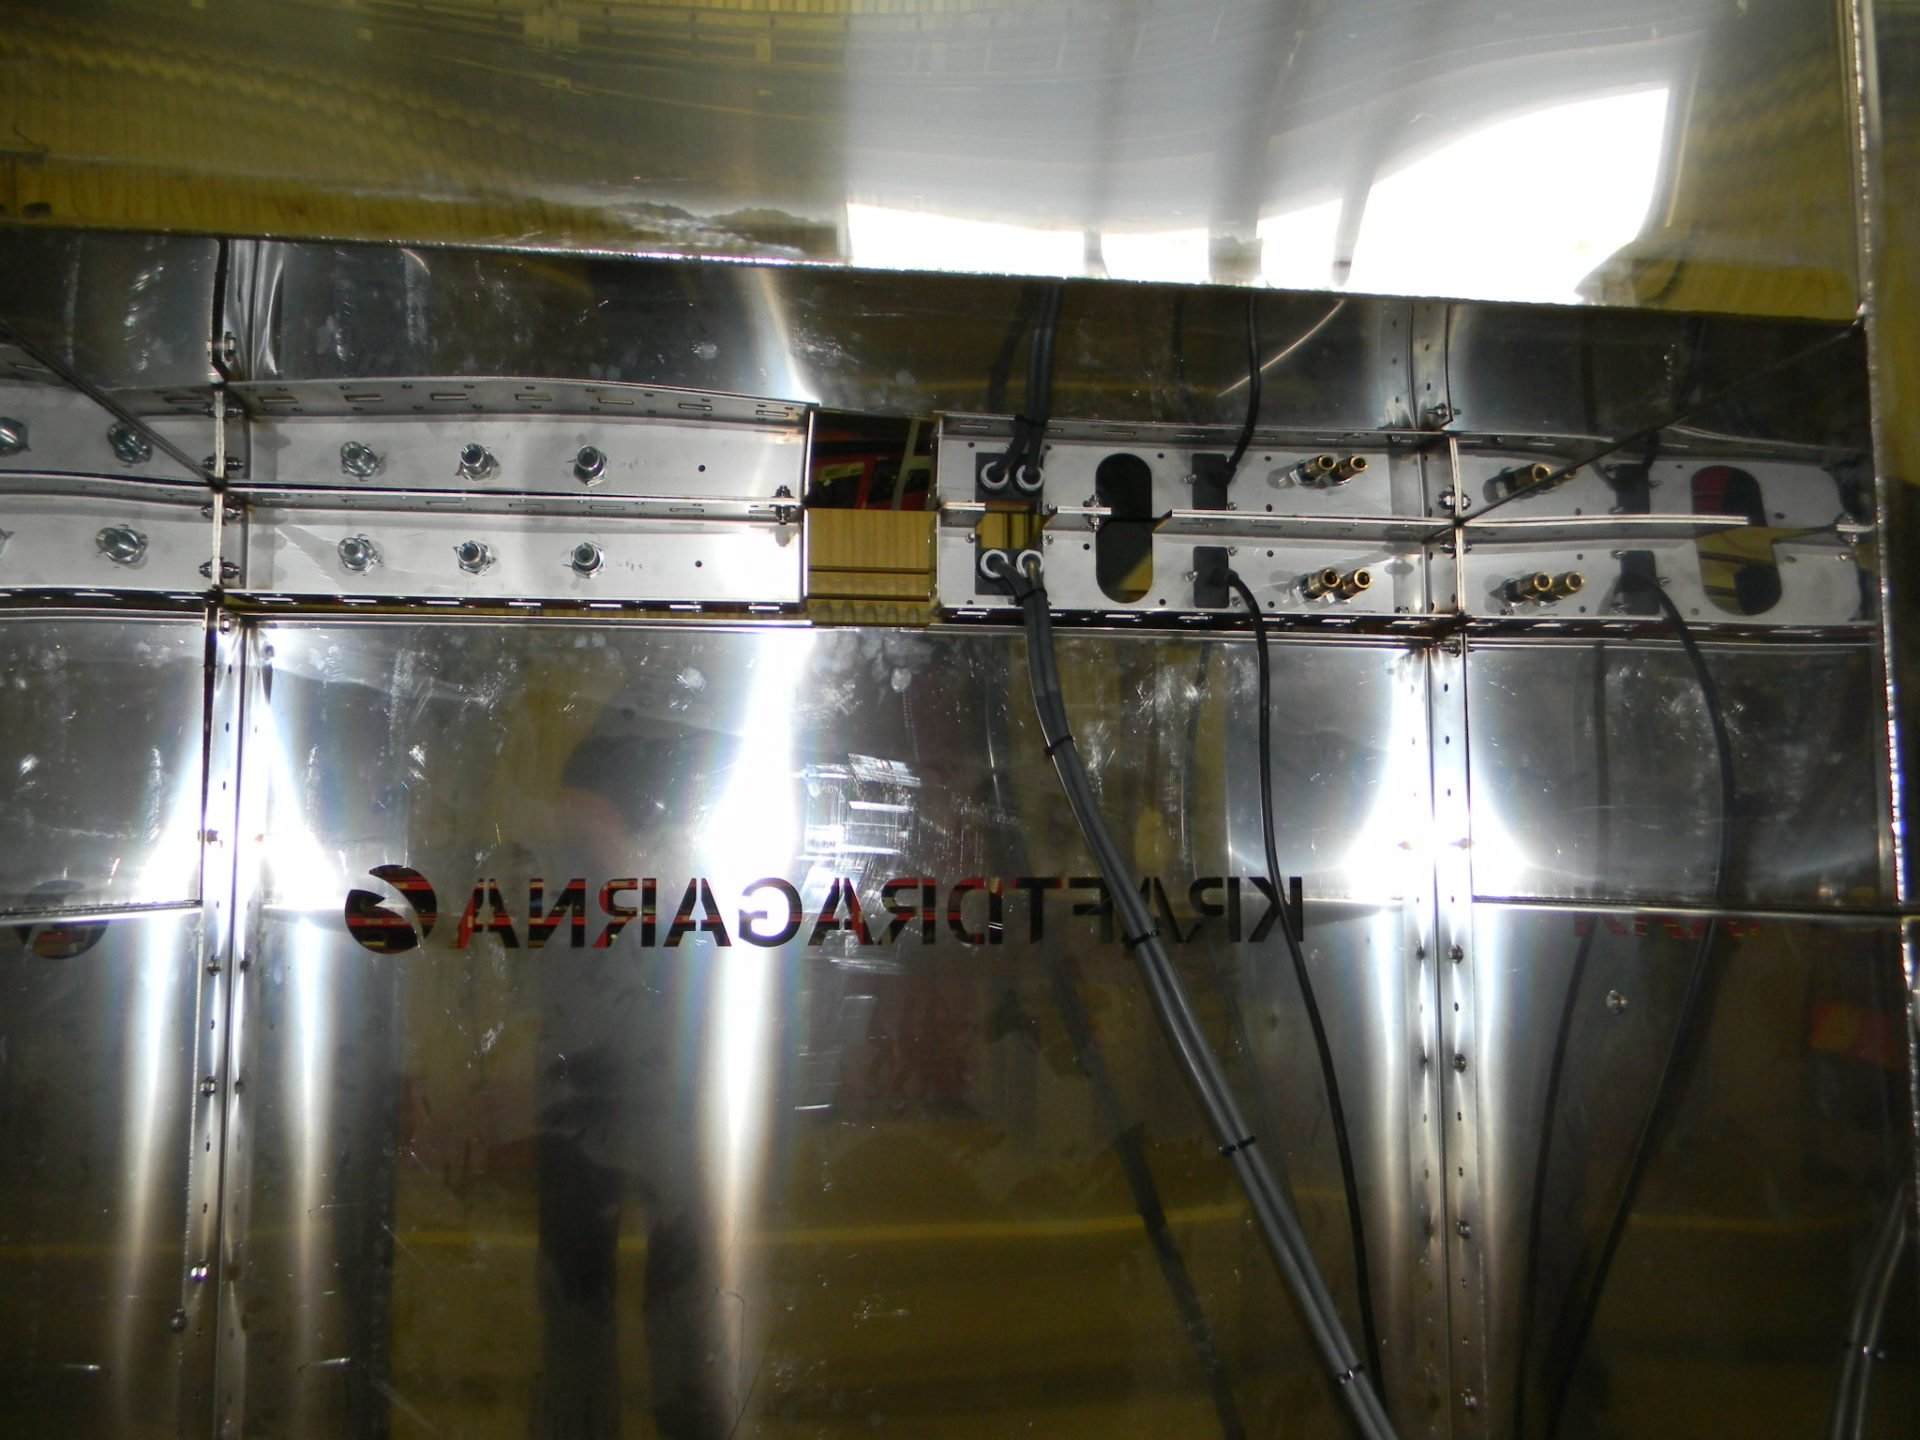 1137342-kraftdragarna-ab-5